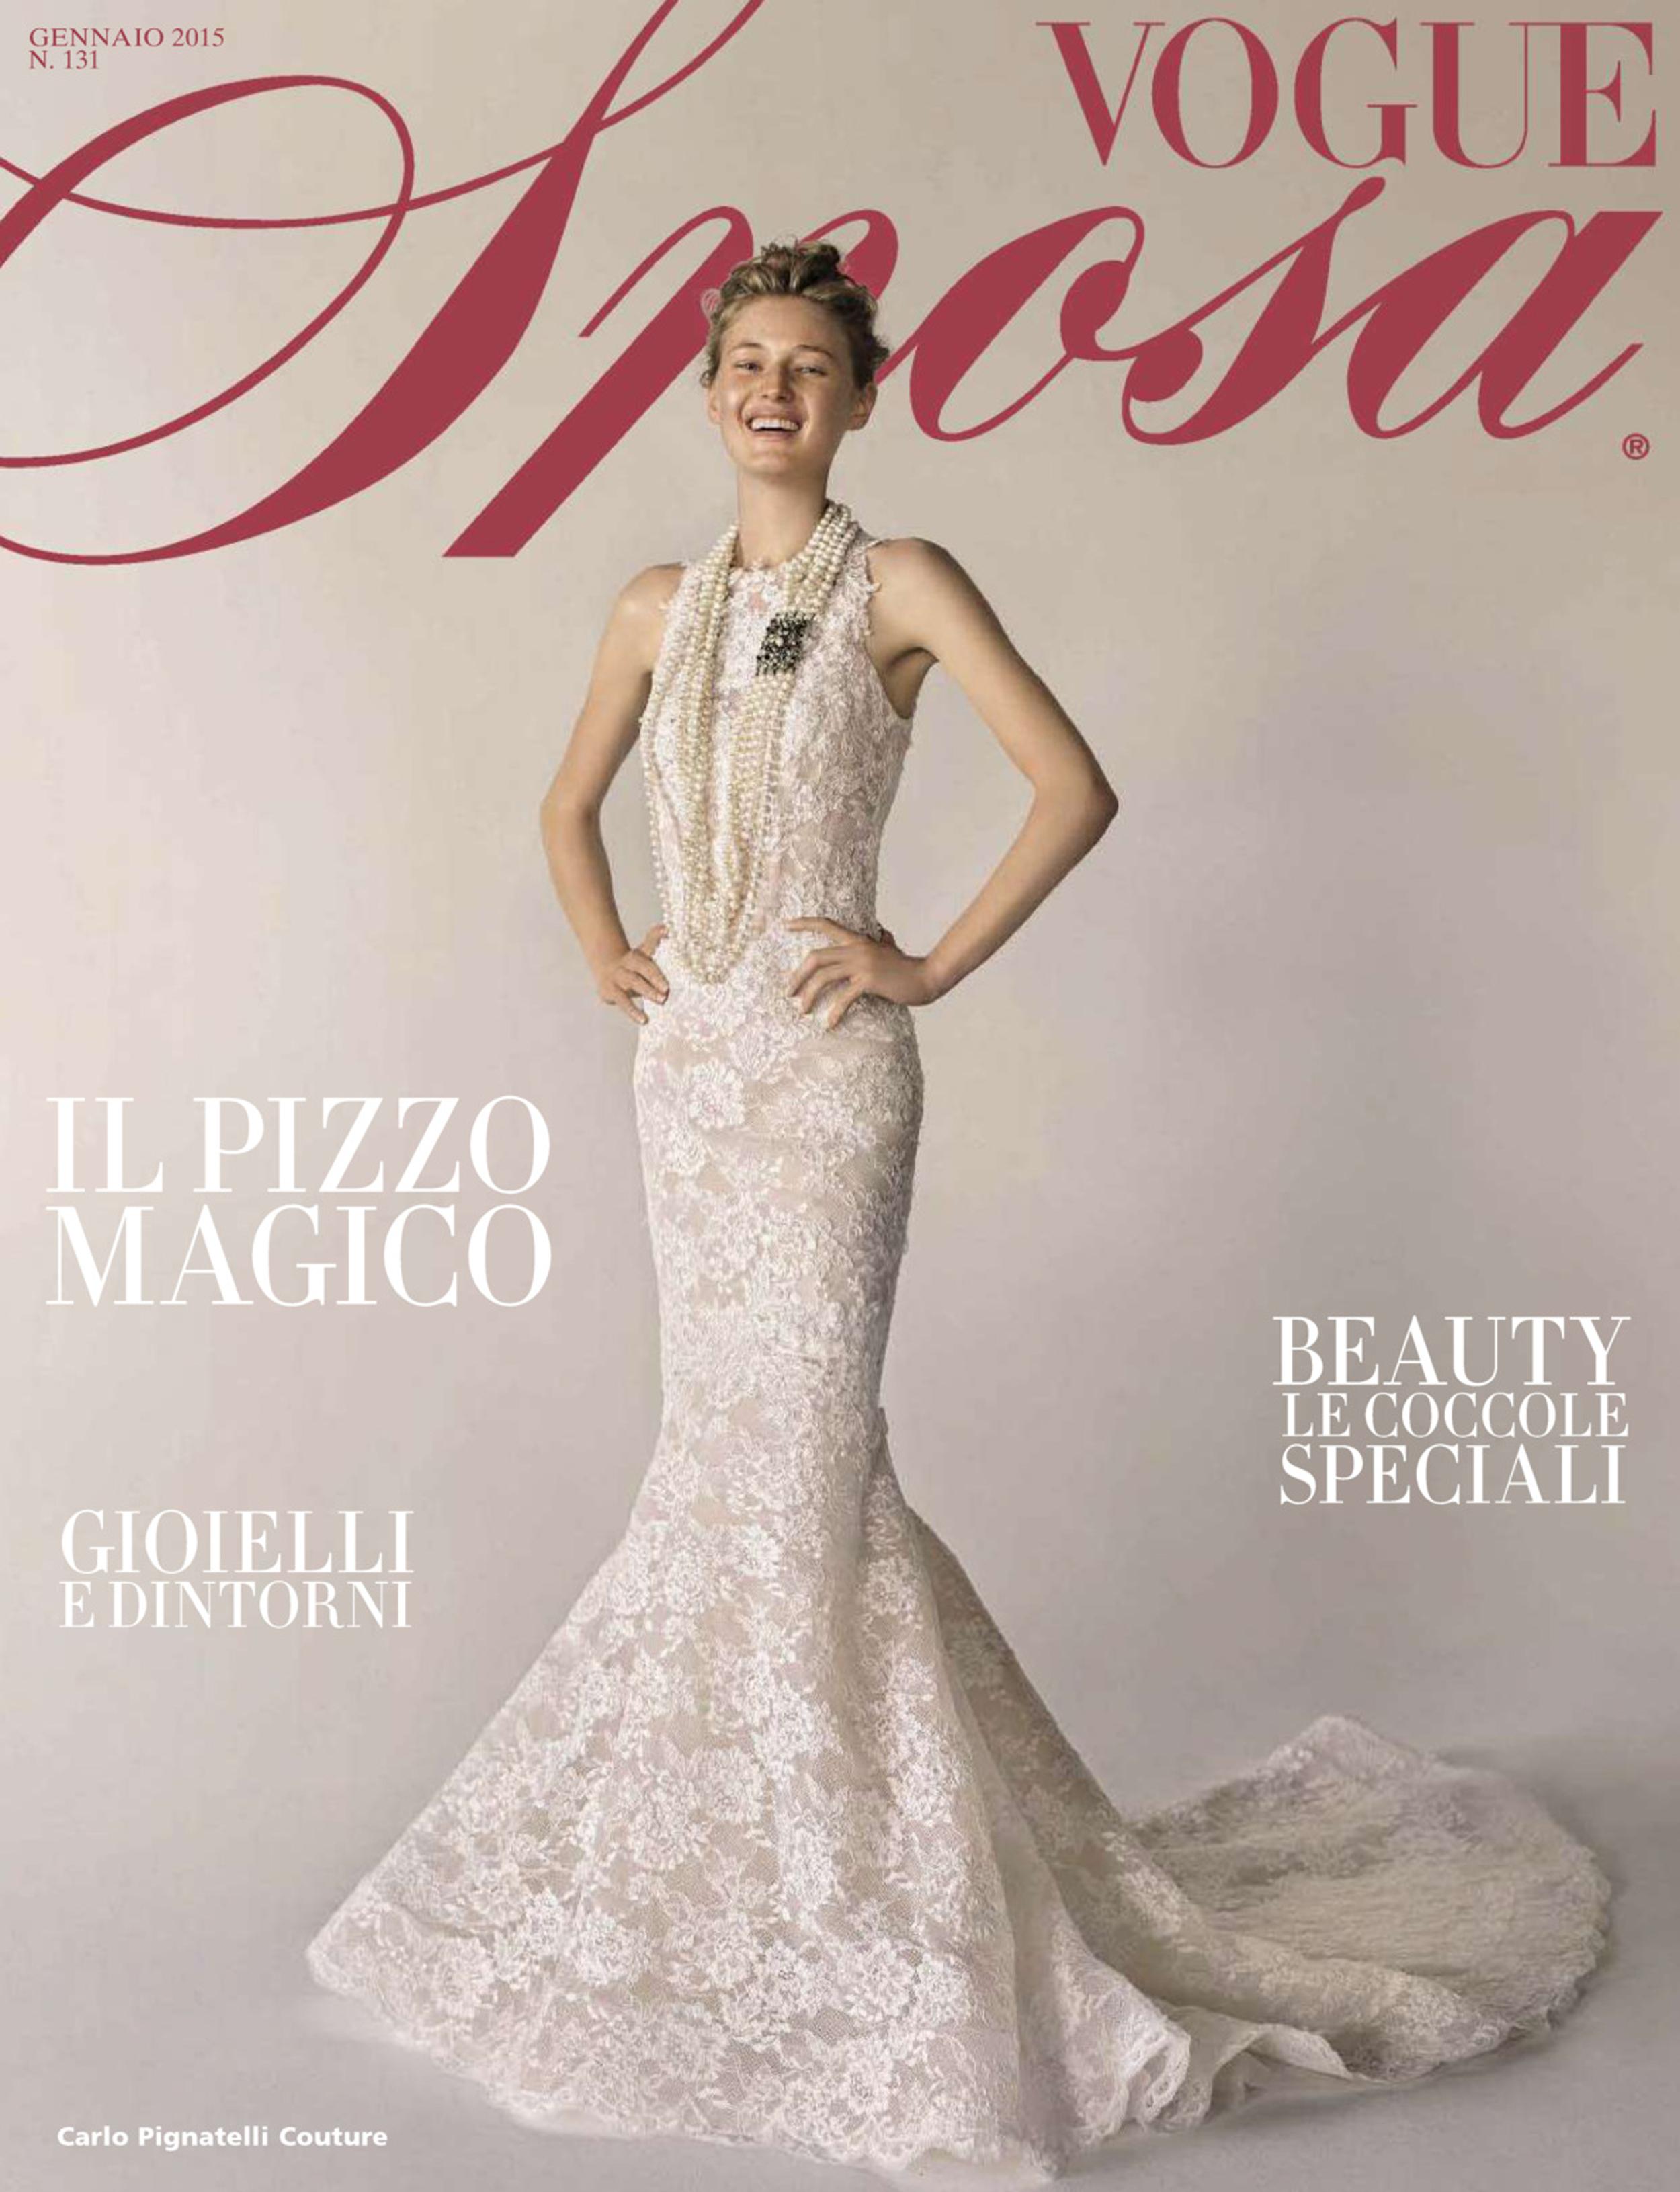 Vogue Sposa Gennaio 2015 Cover.jpg